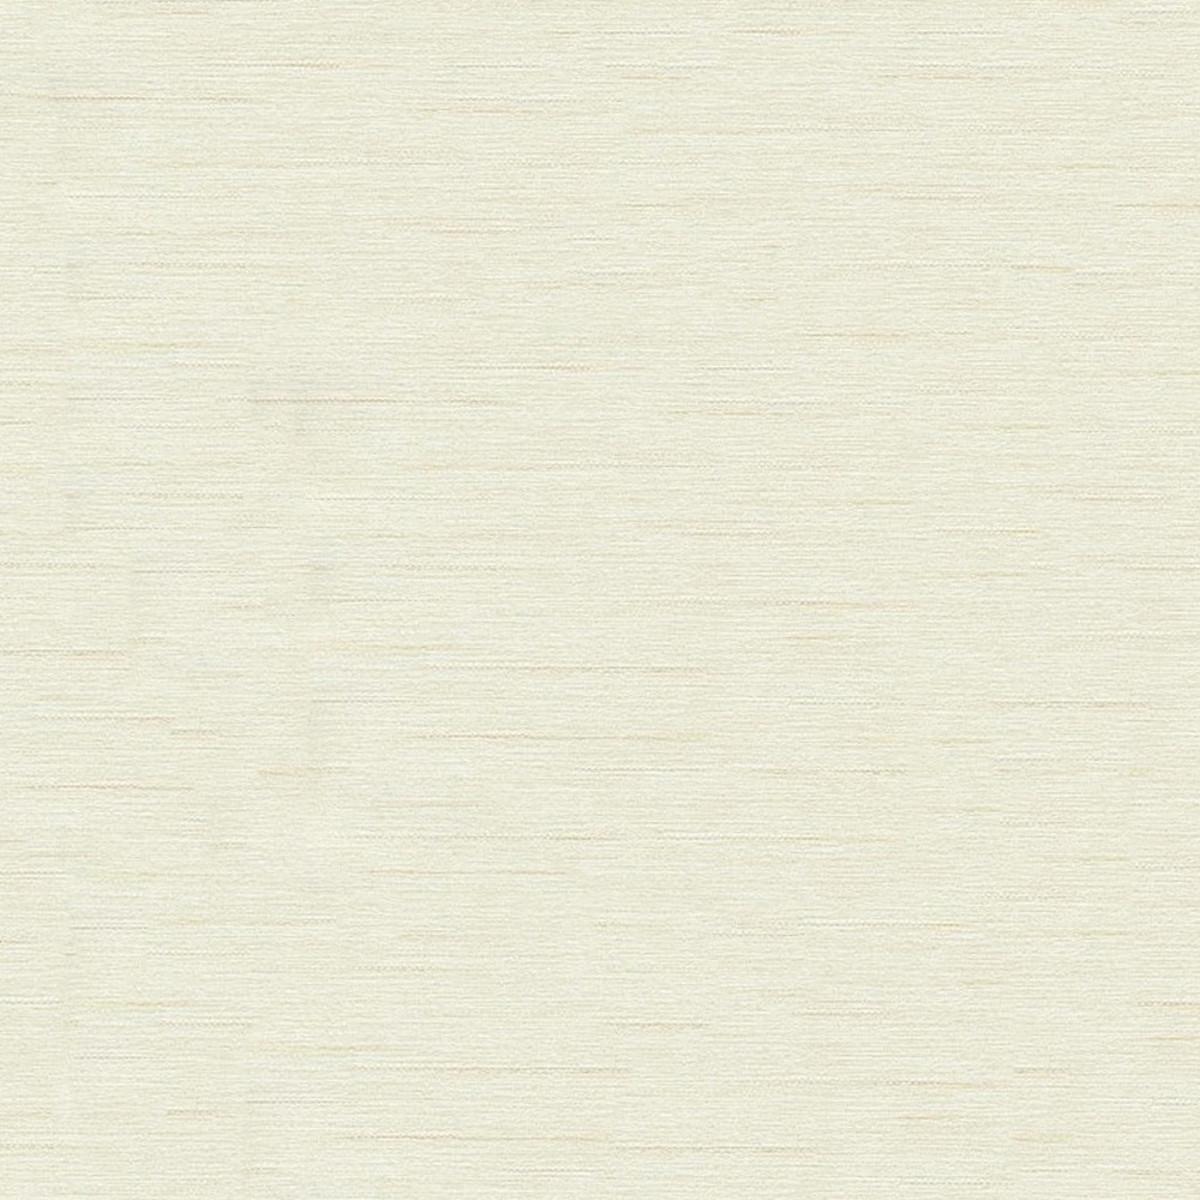 Обои виниловые Shinhan Wallcoverings бежевые 1.06 м 88345-2